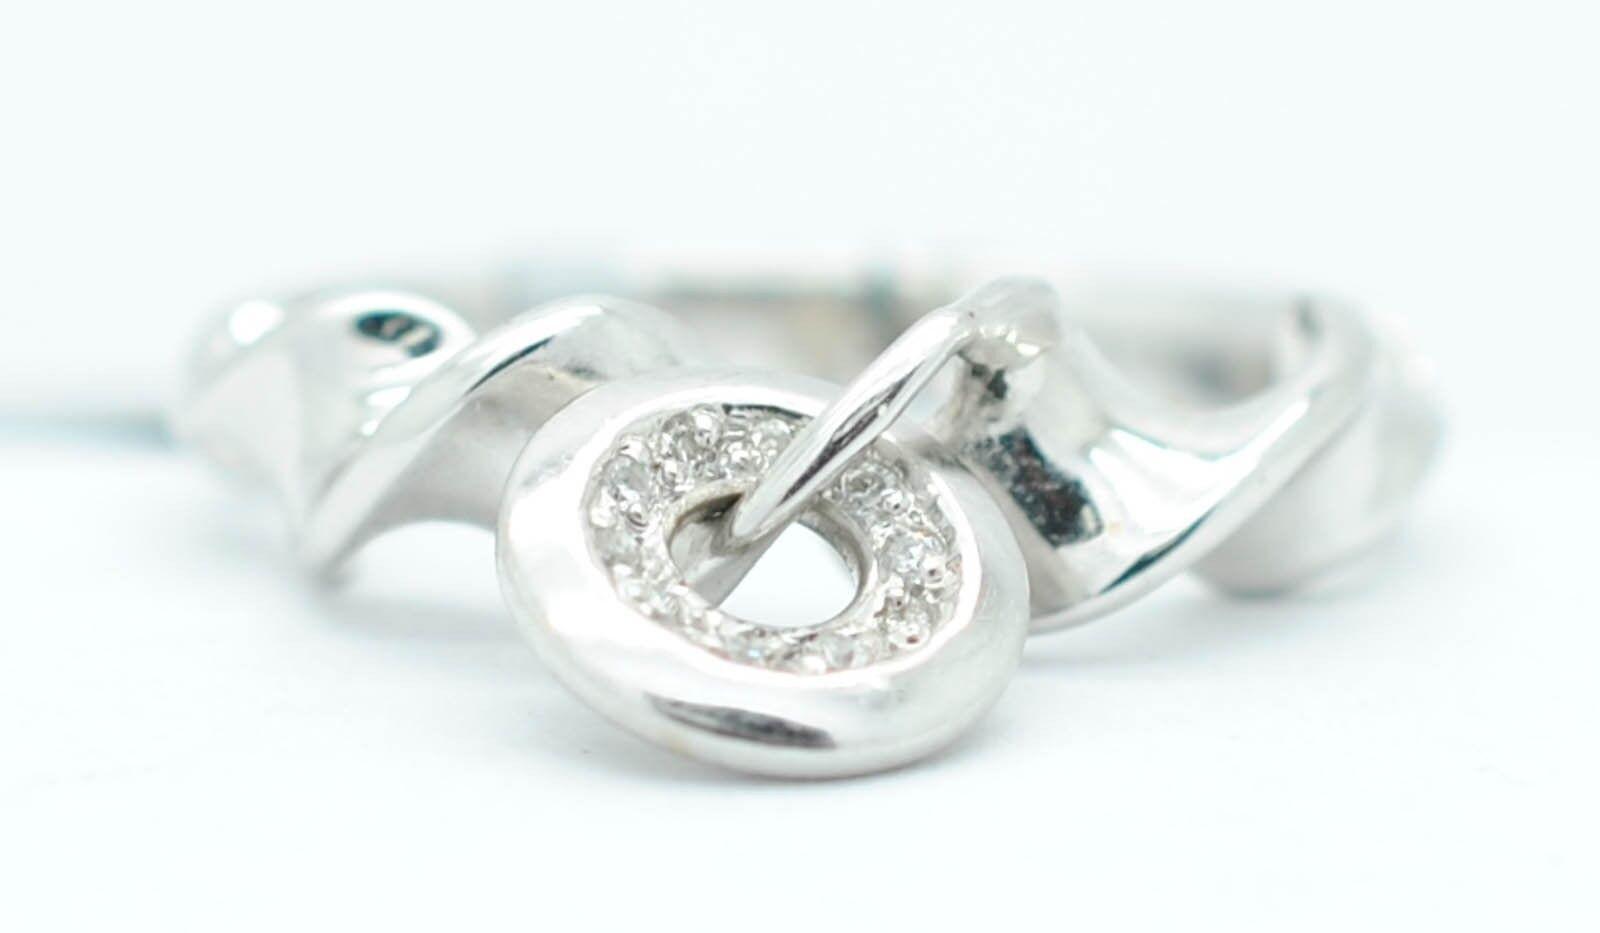 14K White gold 12 Point Diamonds G-SI1 Swirl Ring